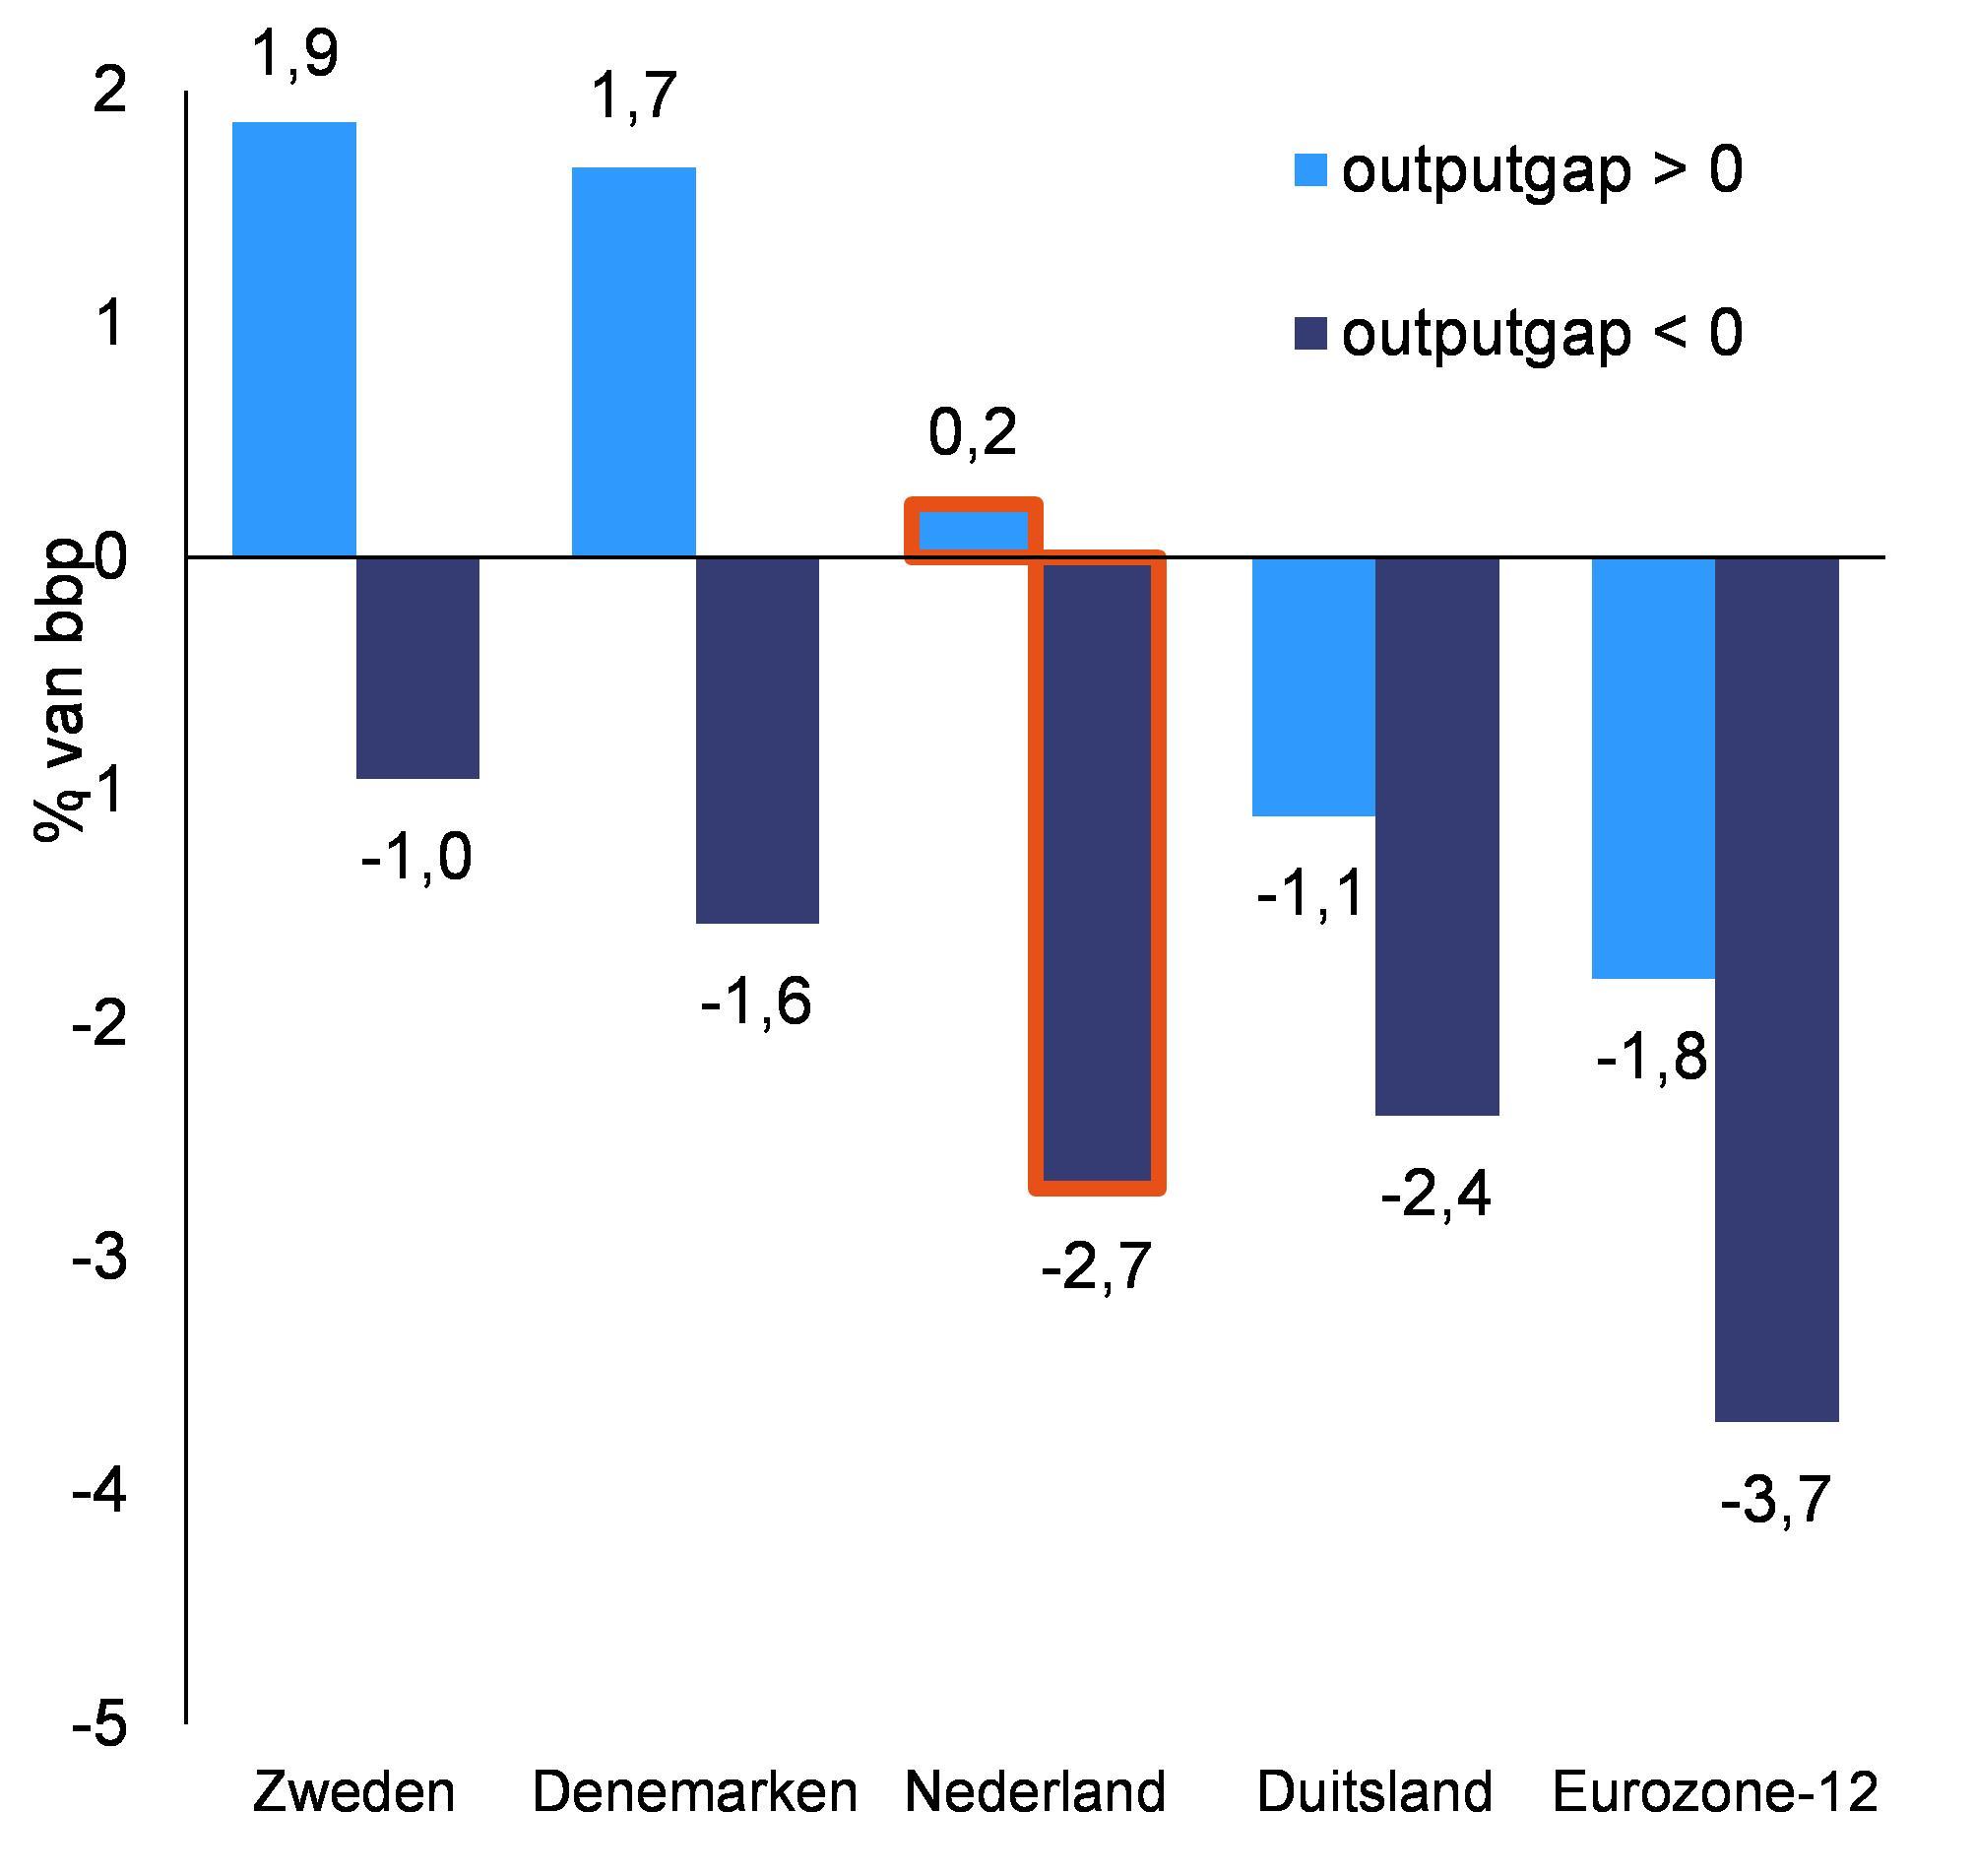 Bron: Afman en Deroose (2016); gemiddelde 1996-2015.